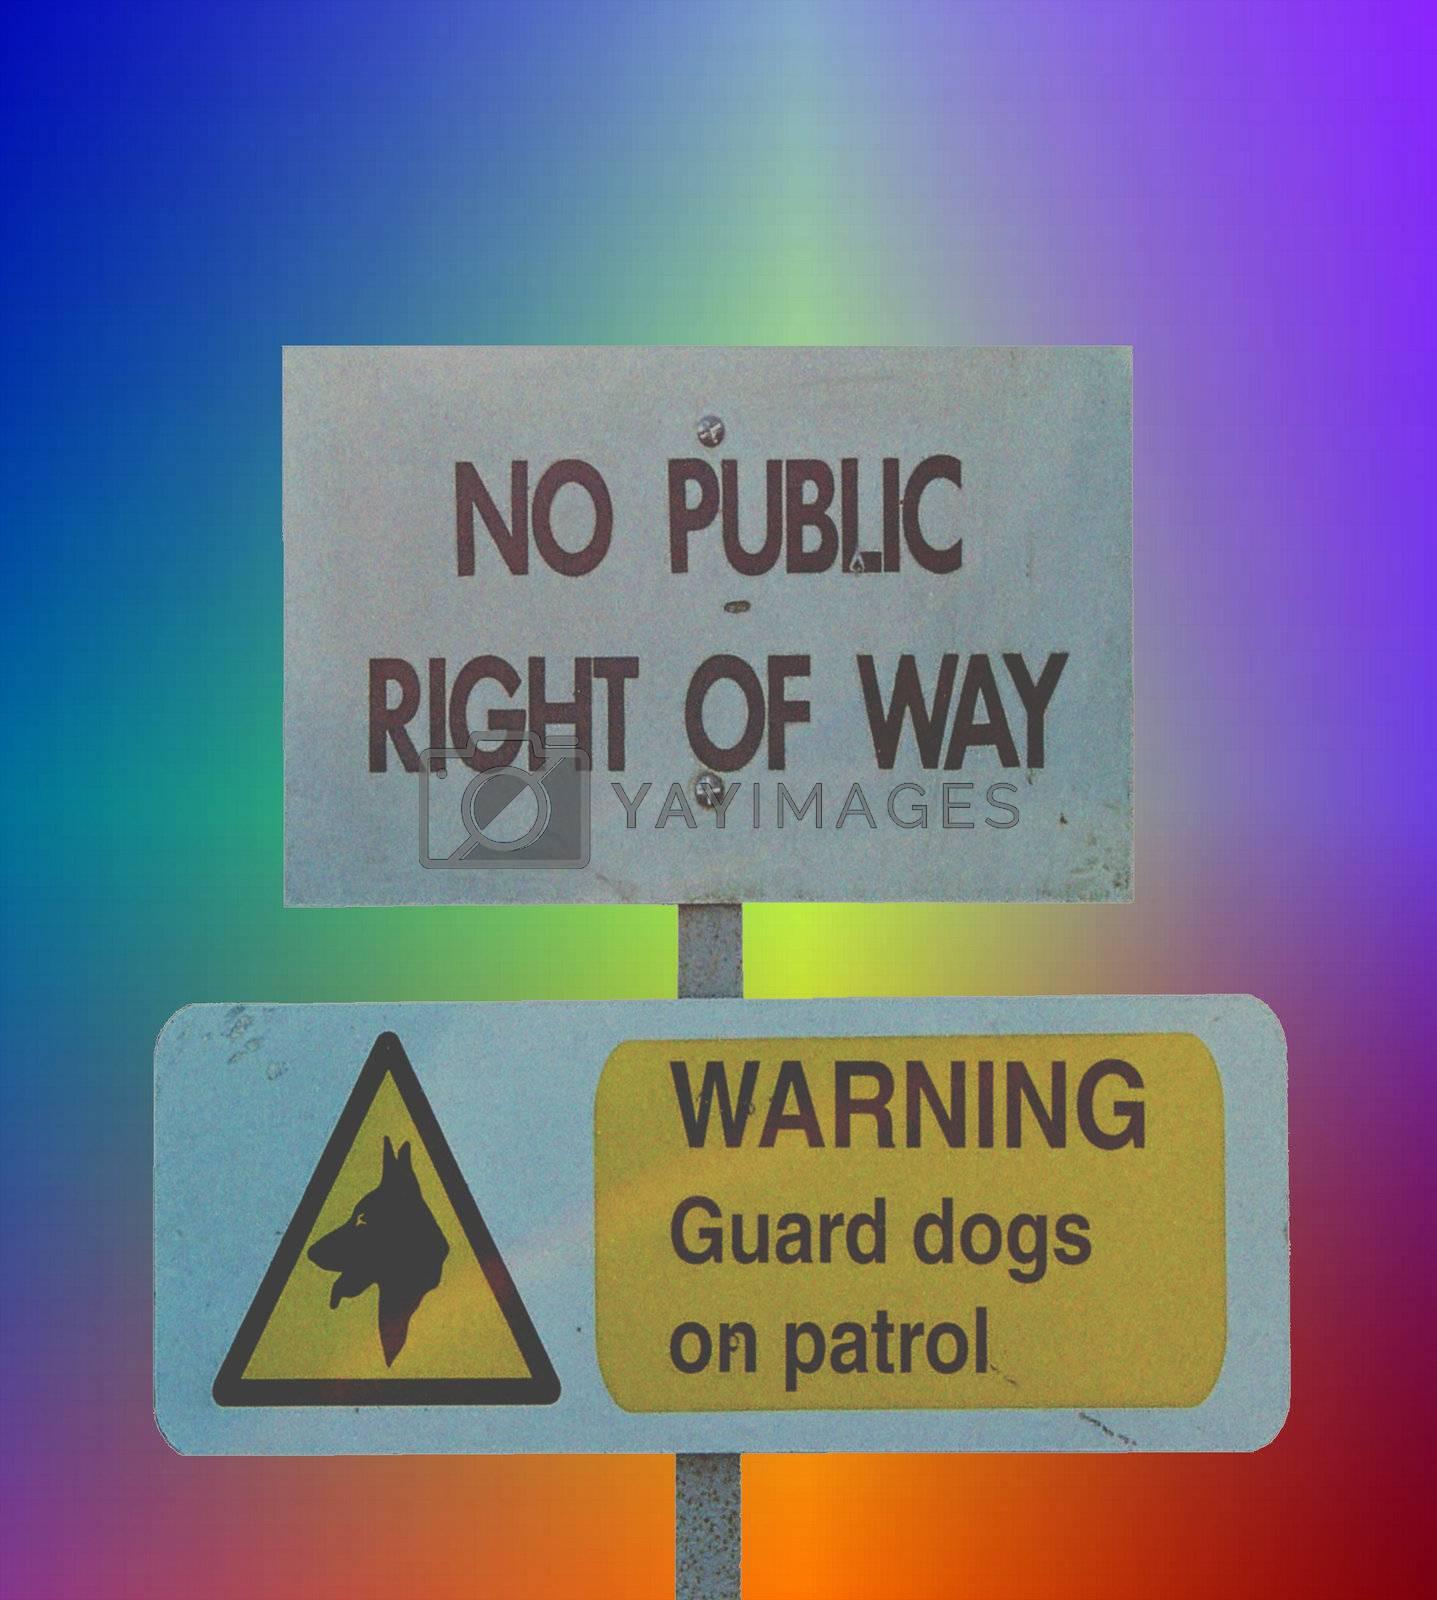 colorful warning sign